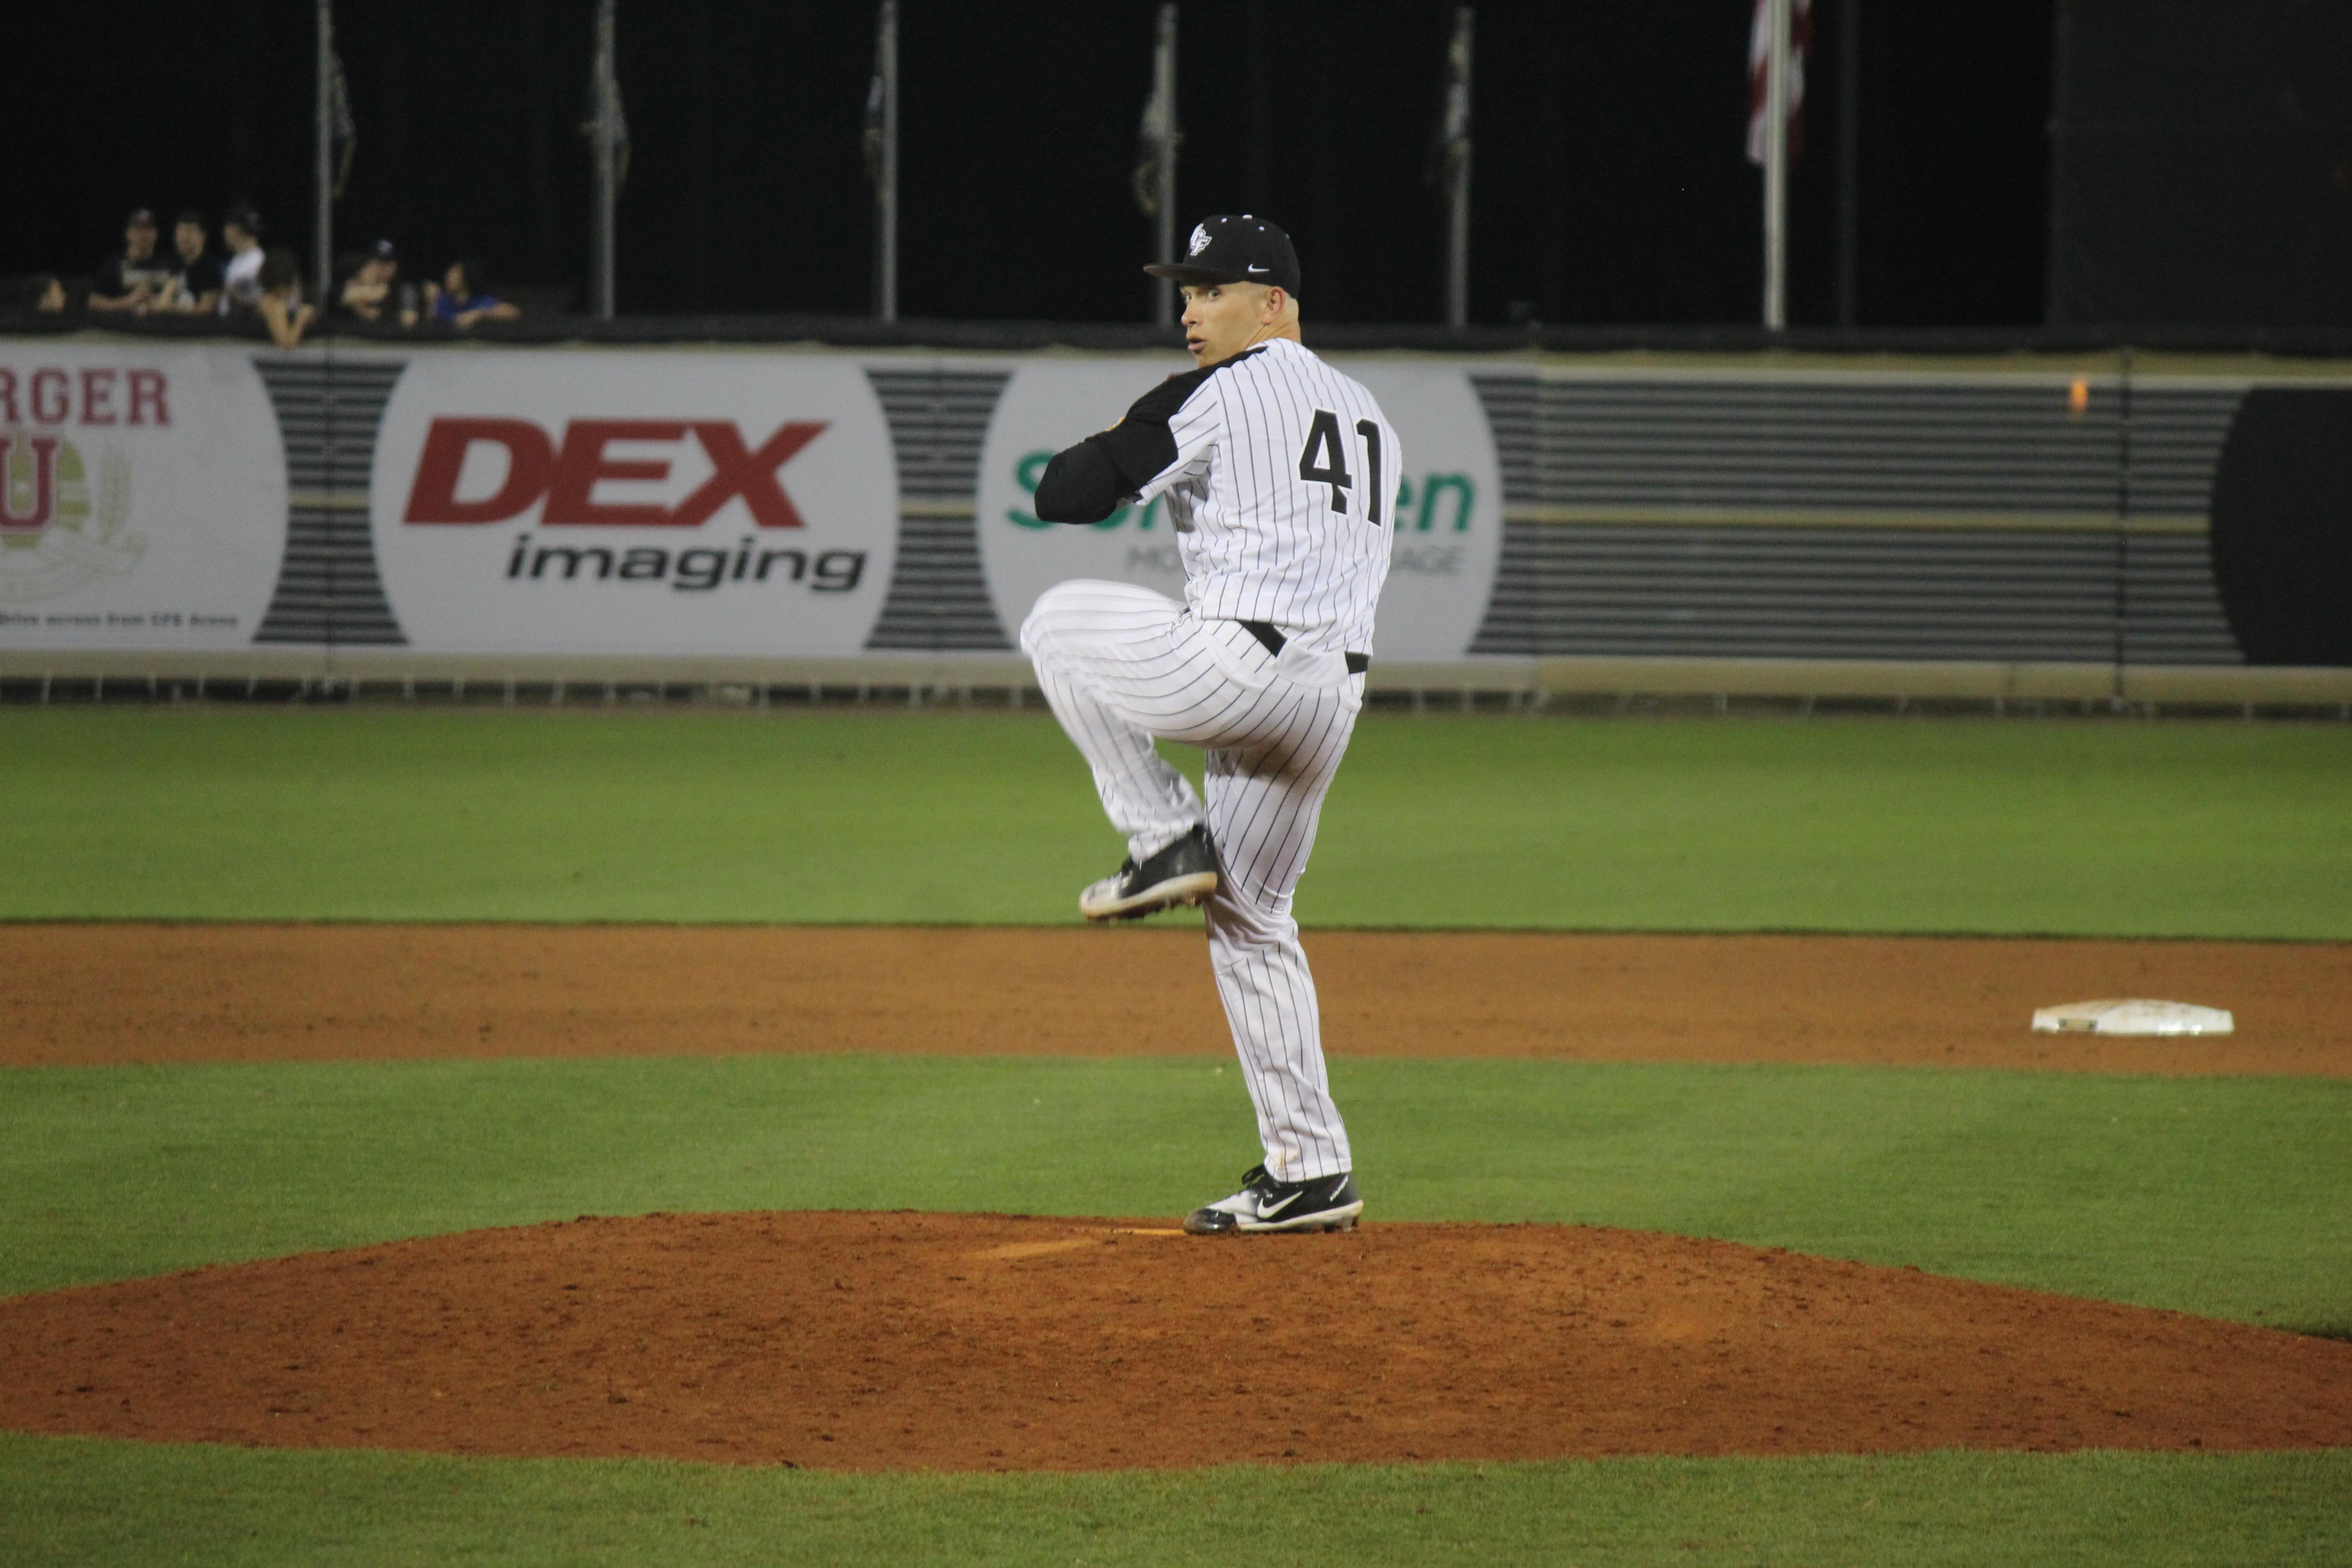 Gallery: UCF Baseball tops No. 15 Virginia